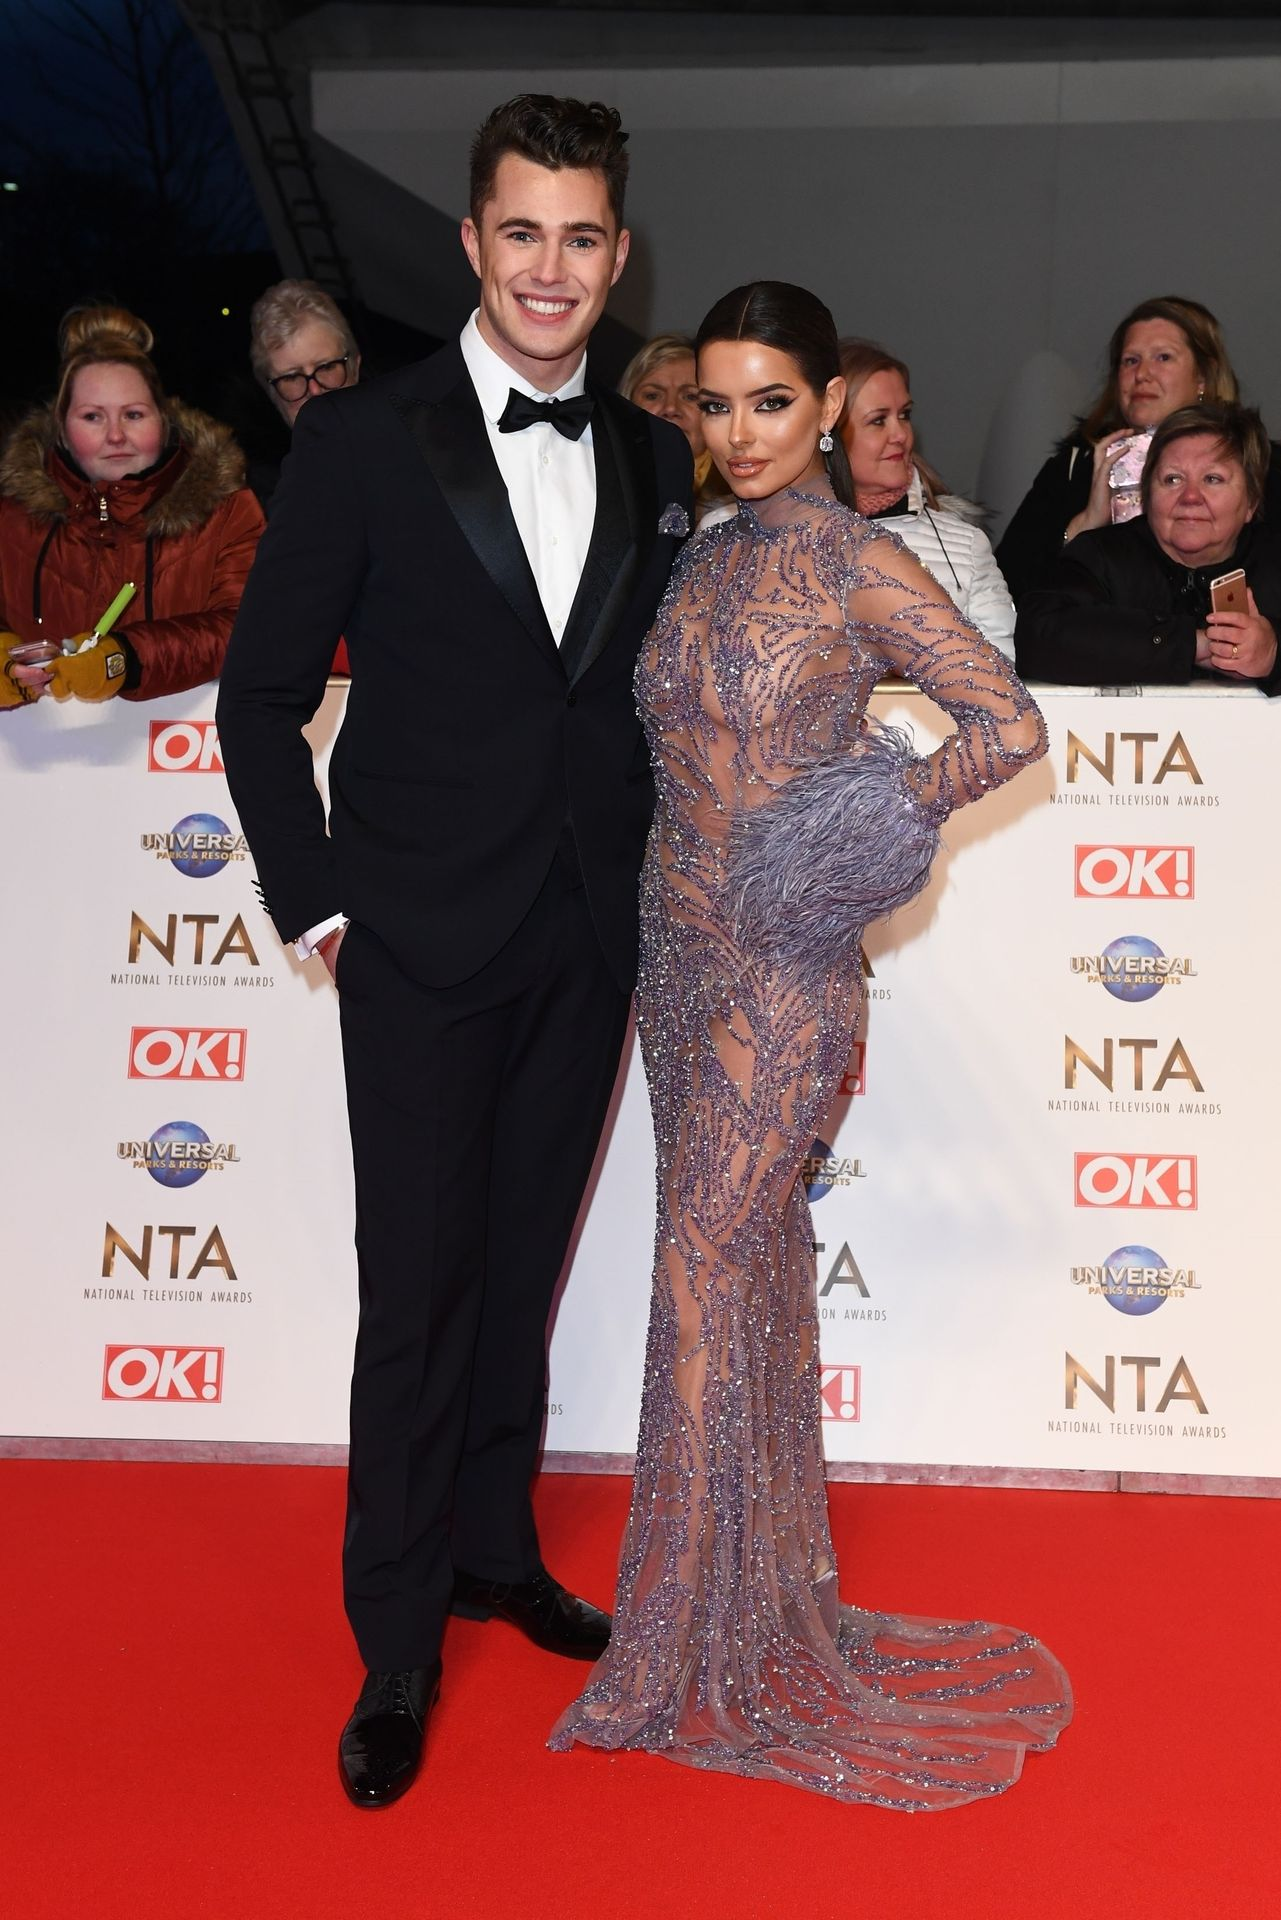 Maura Higgins Looks Hot At The National Television Awards 0004